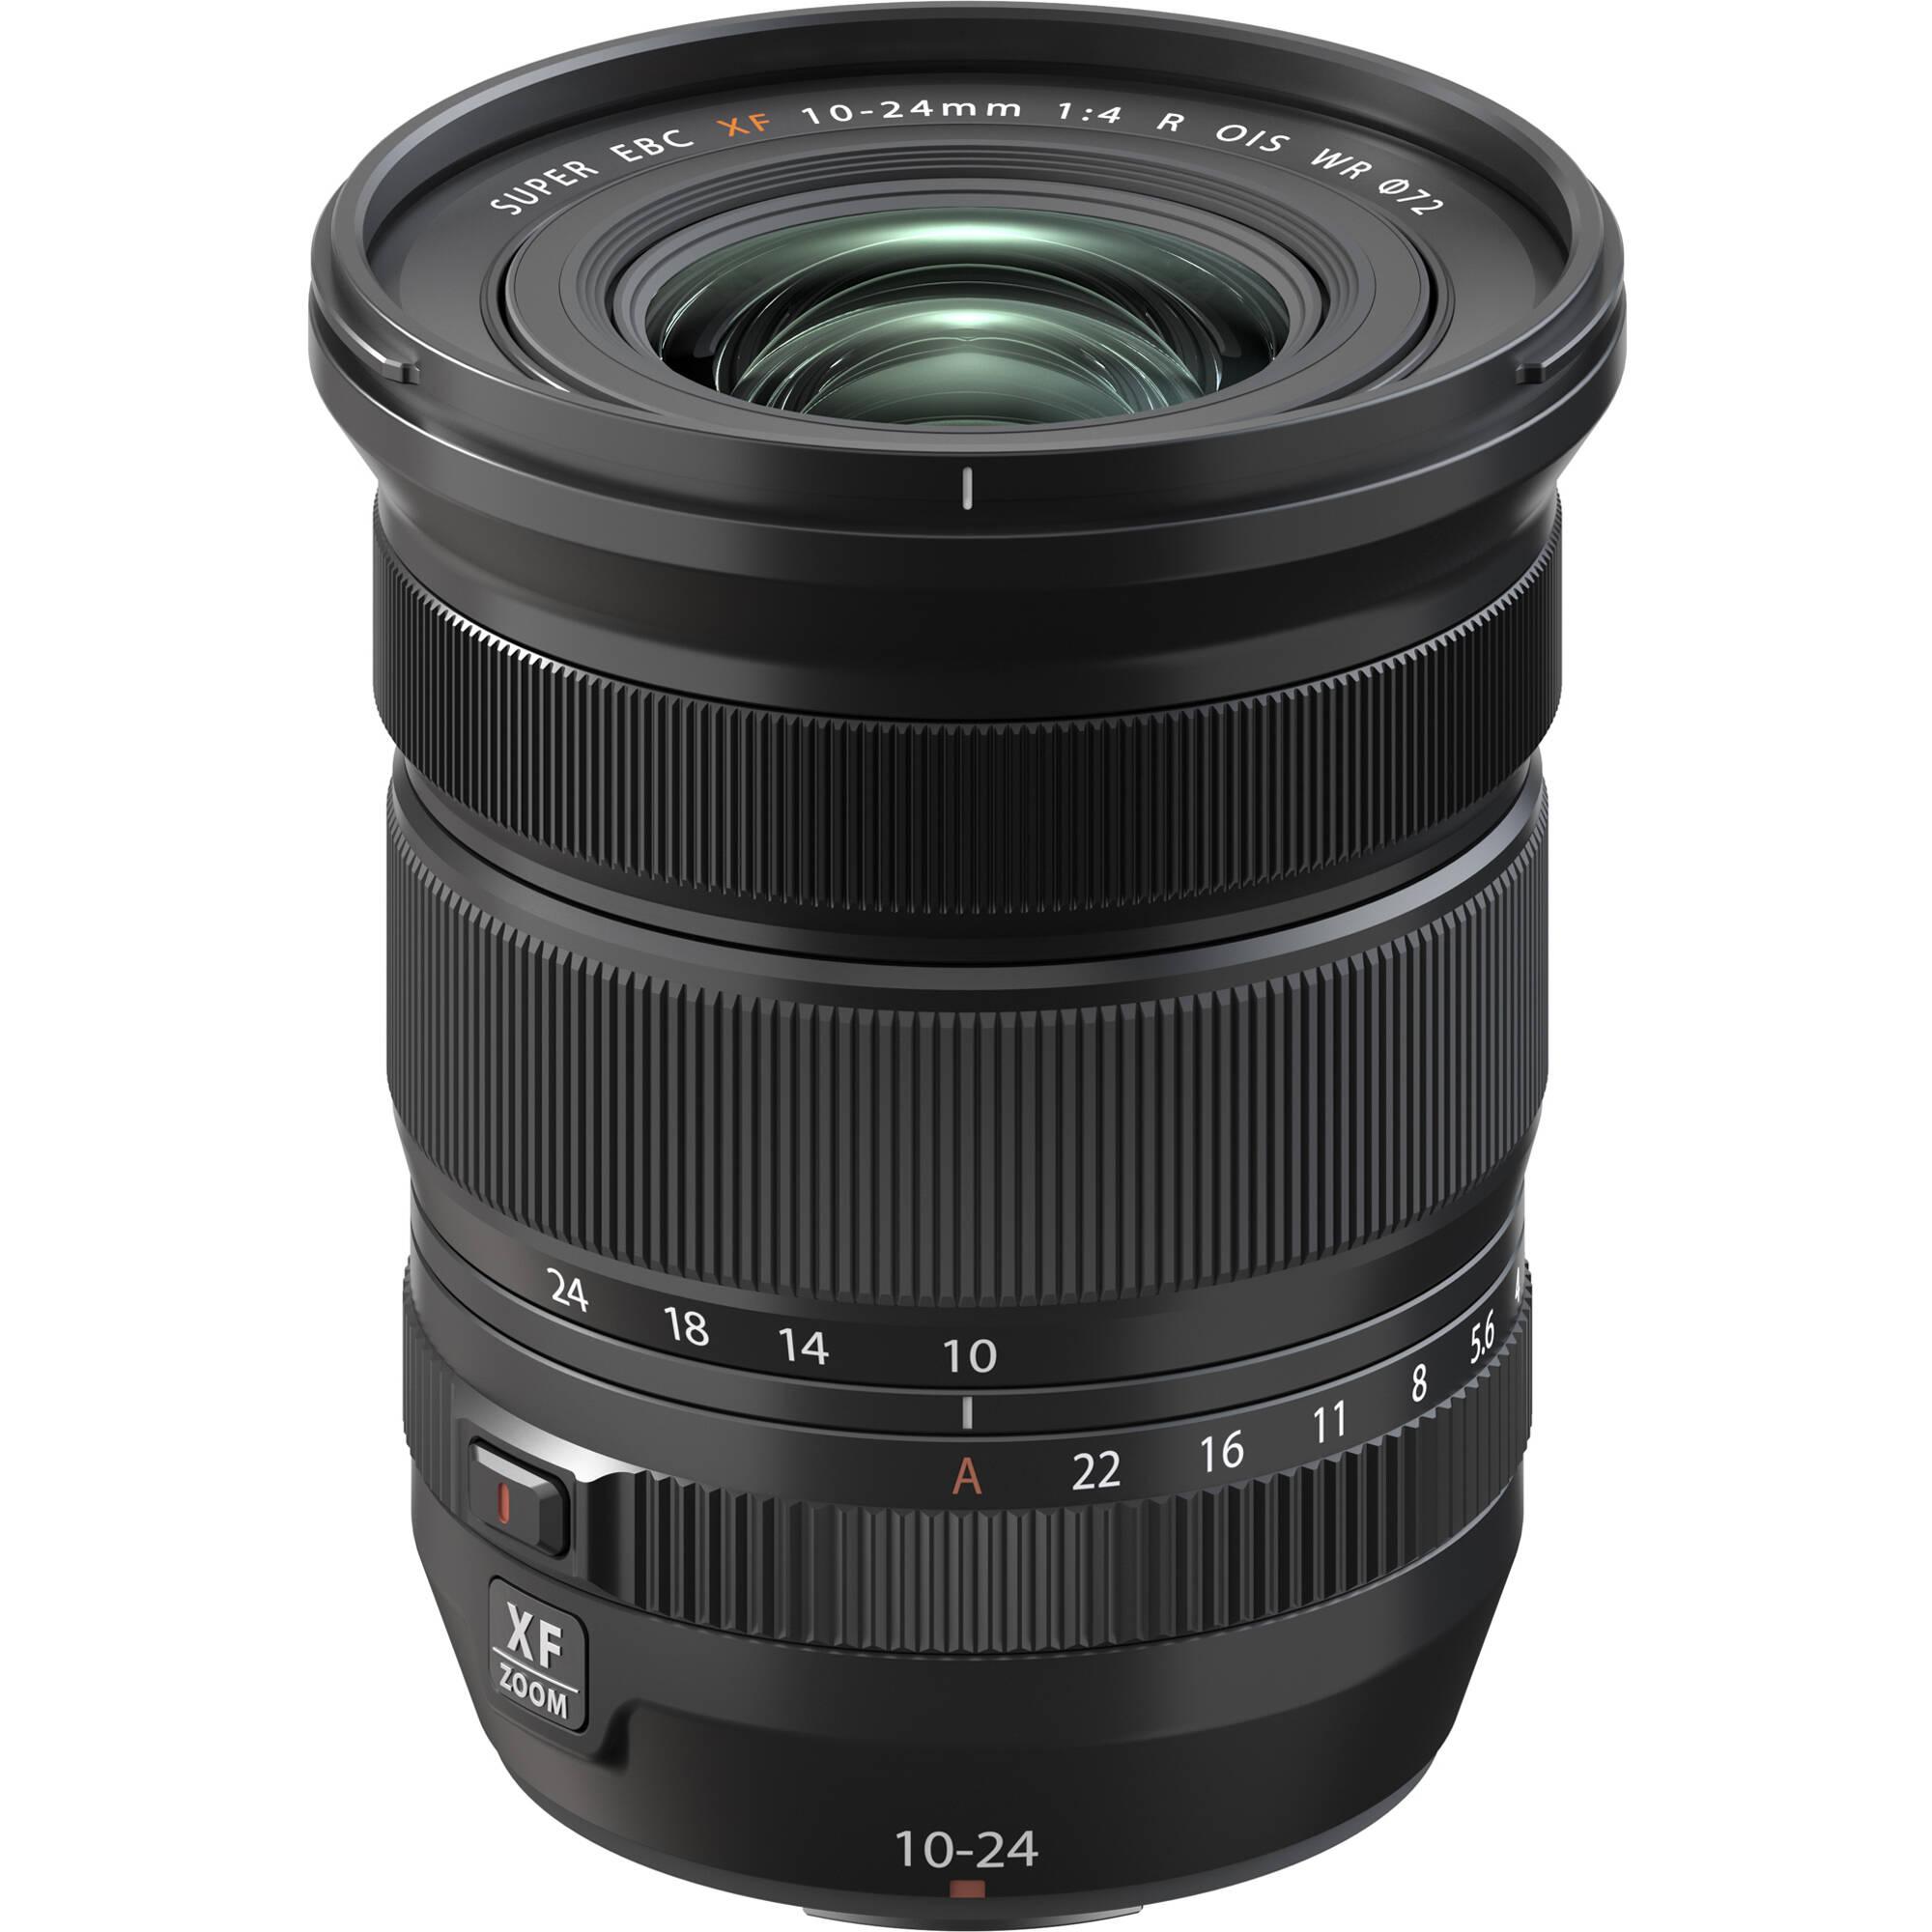 2x Rear Cap Cover for Fuji Fujifilm Micro SLR X-Mount Camera Lens XF 23 1.4R